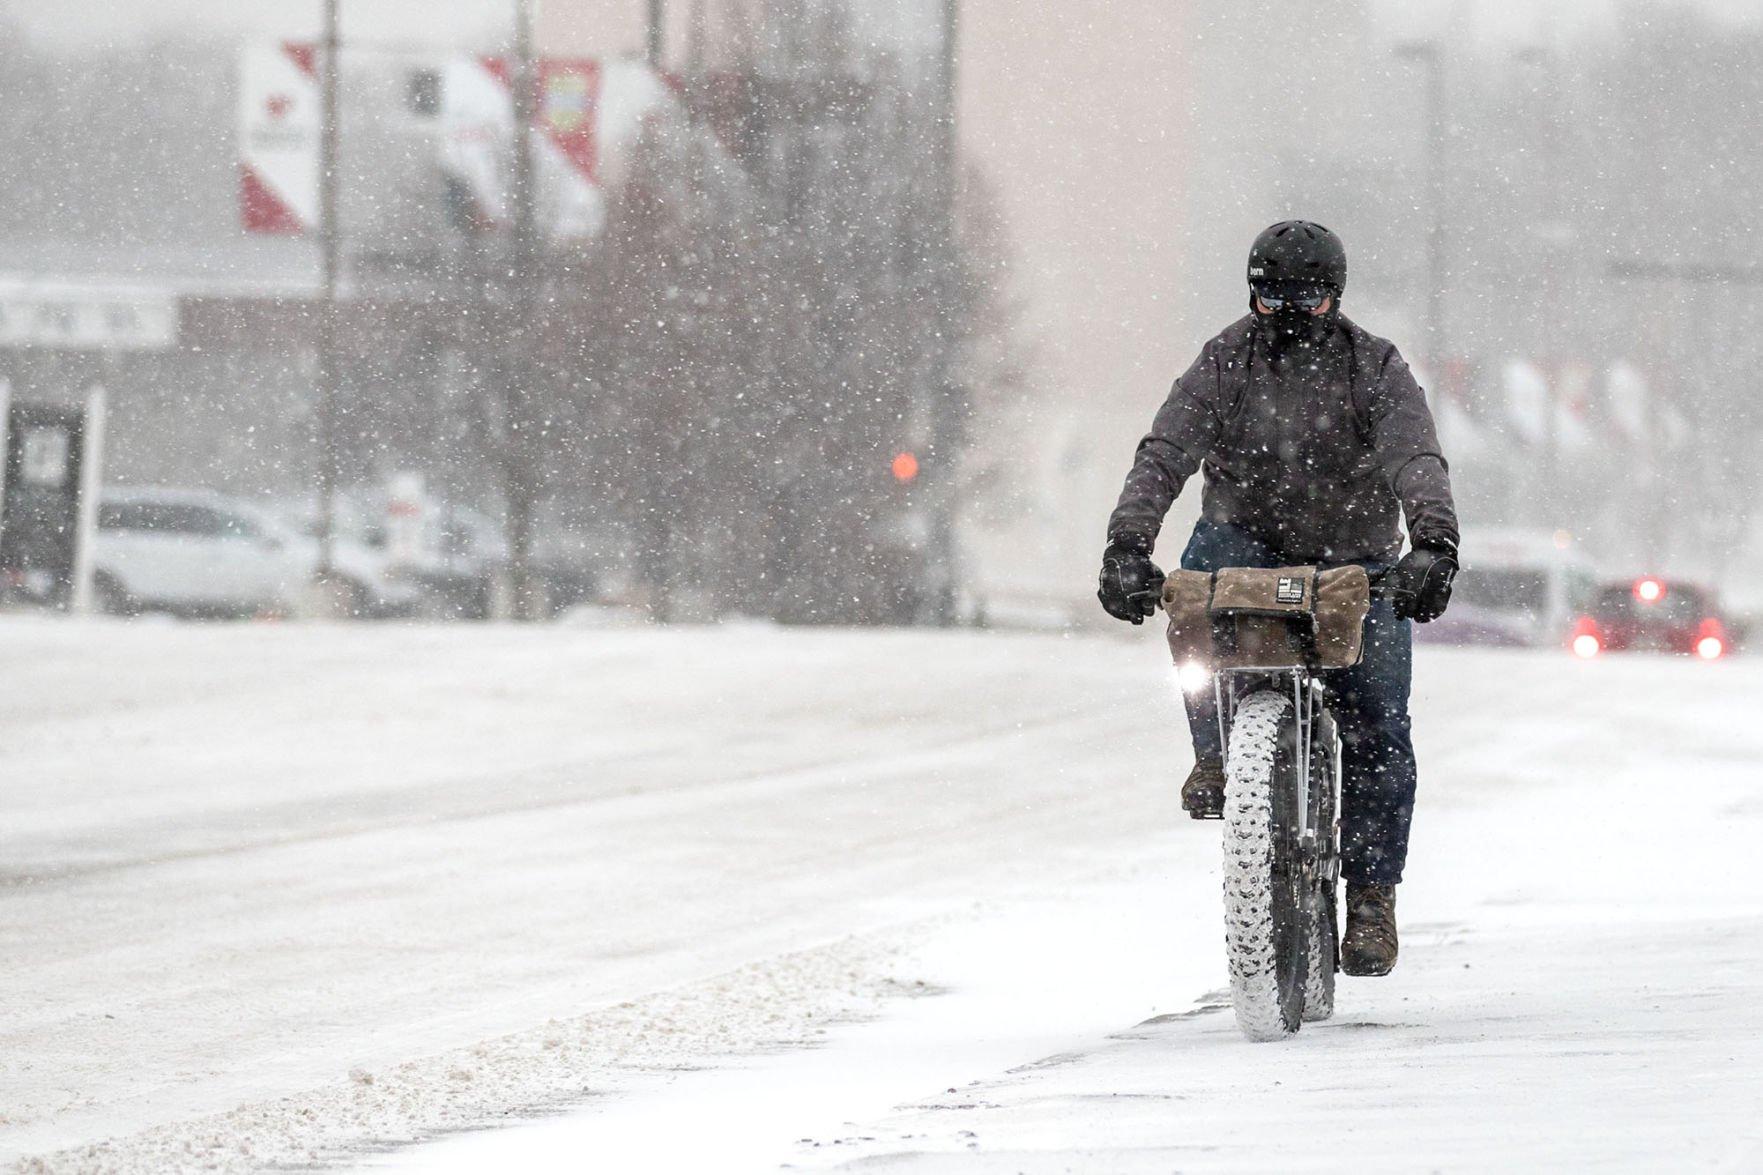 Buy Now Roads improving in Omaha area